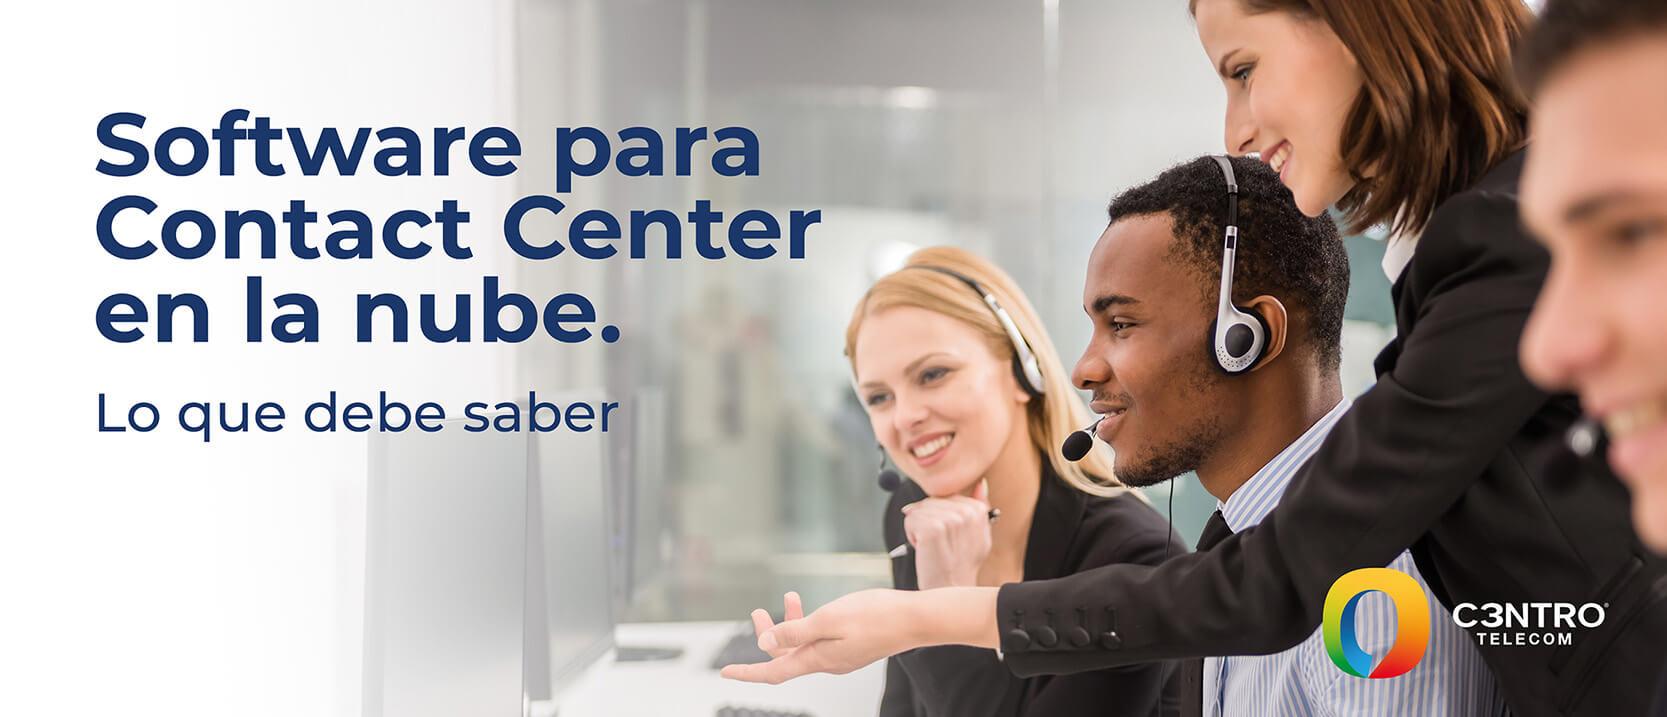 software para contact center